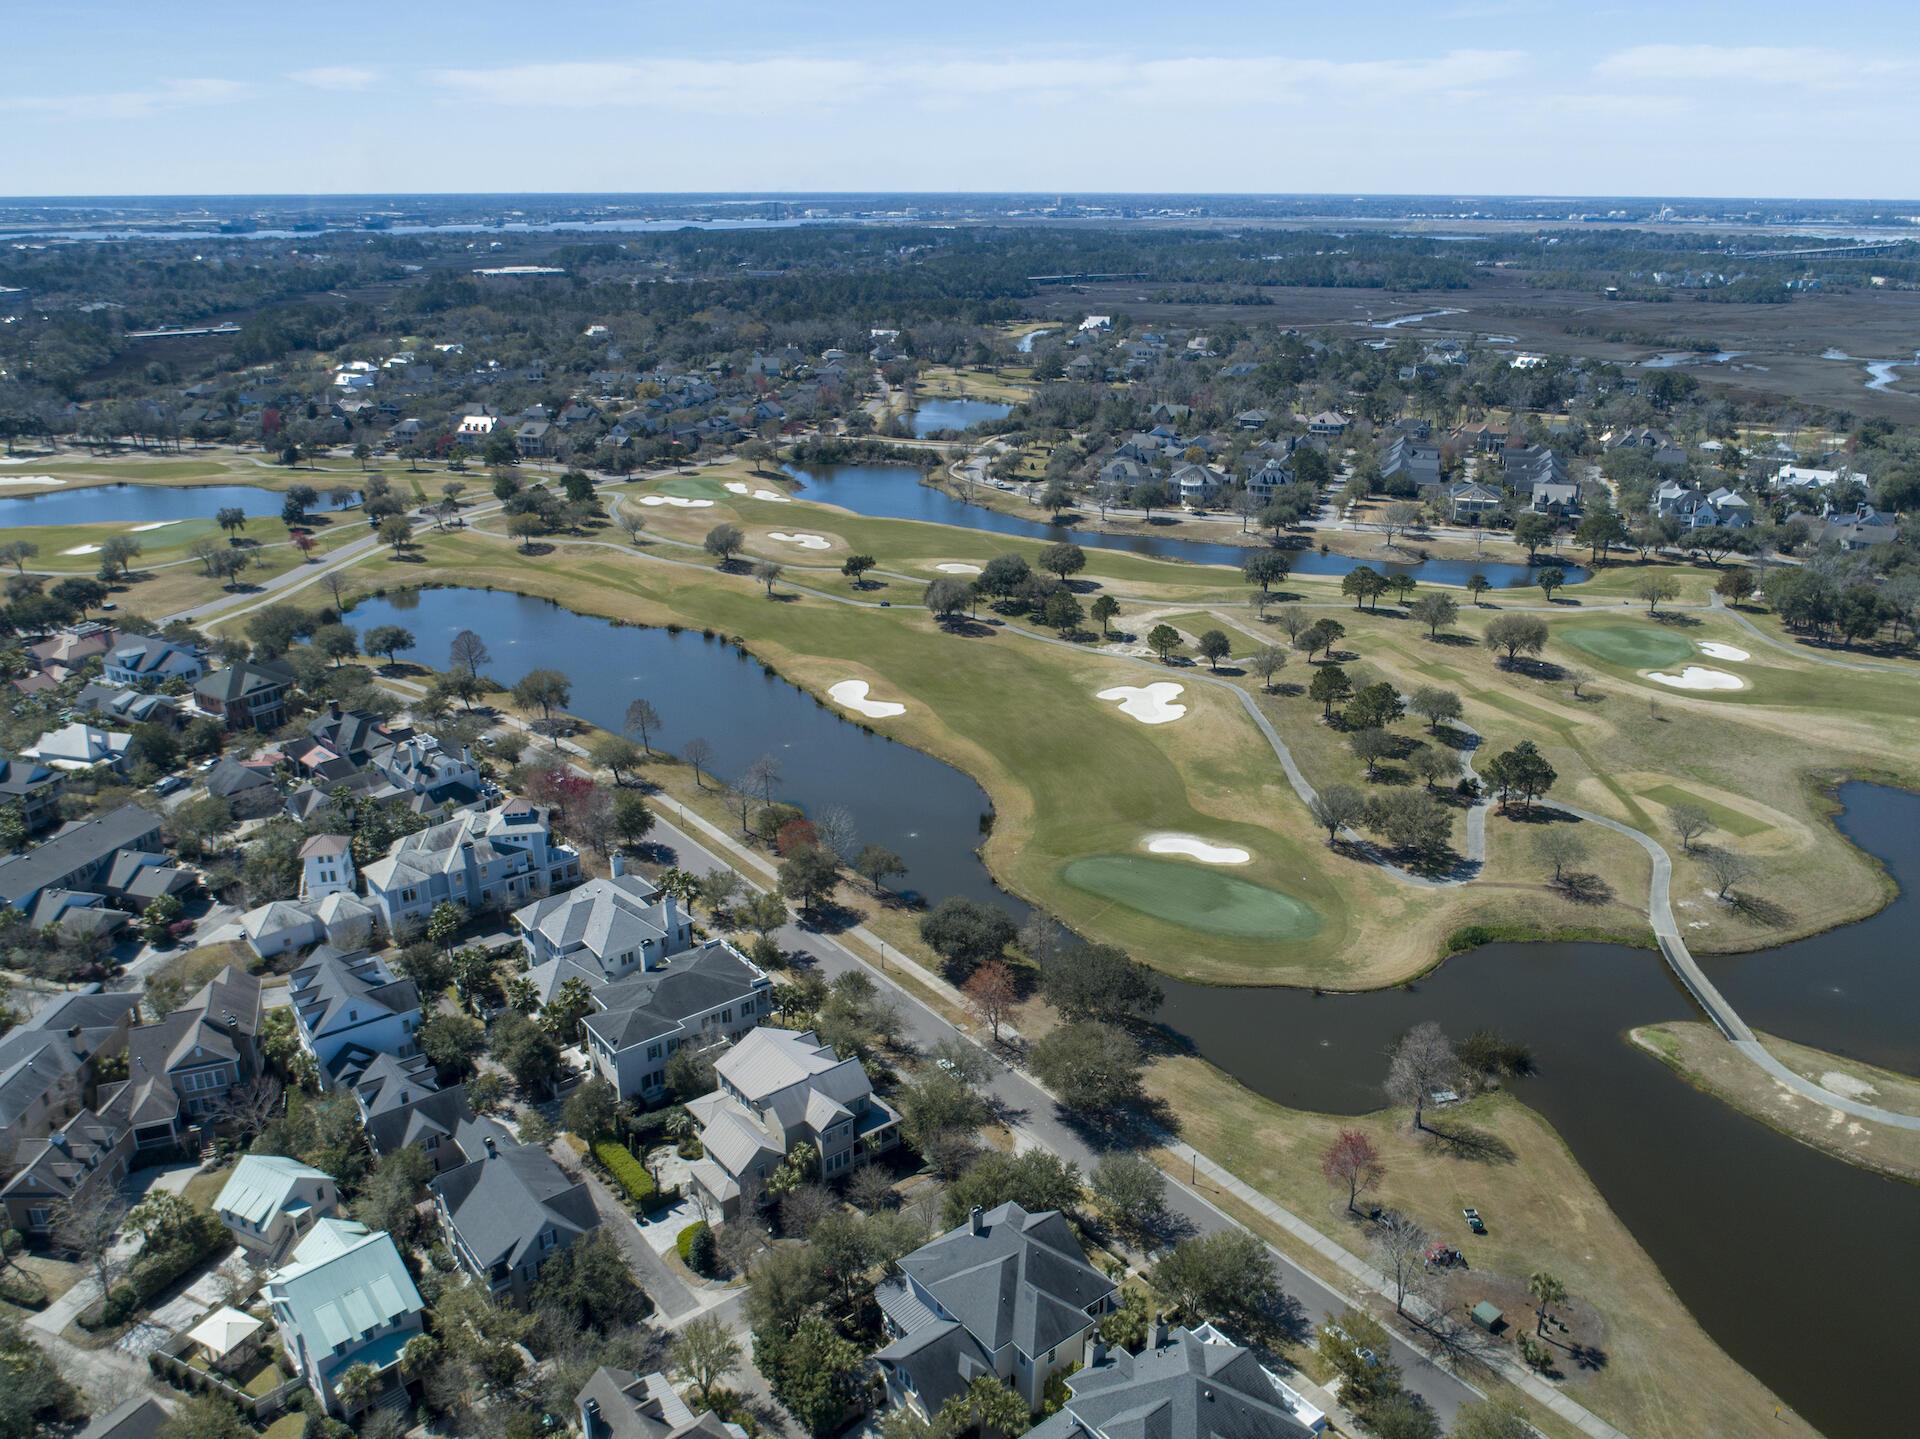 Daniel Island Homes For Sale - 623 Island Park, Charleston, SC - 2